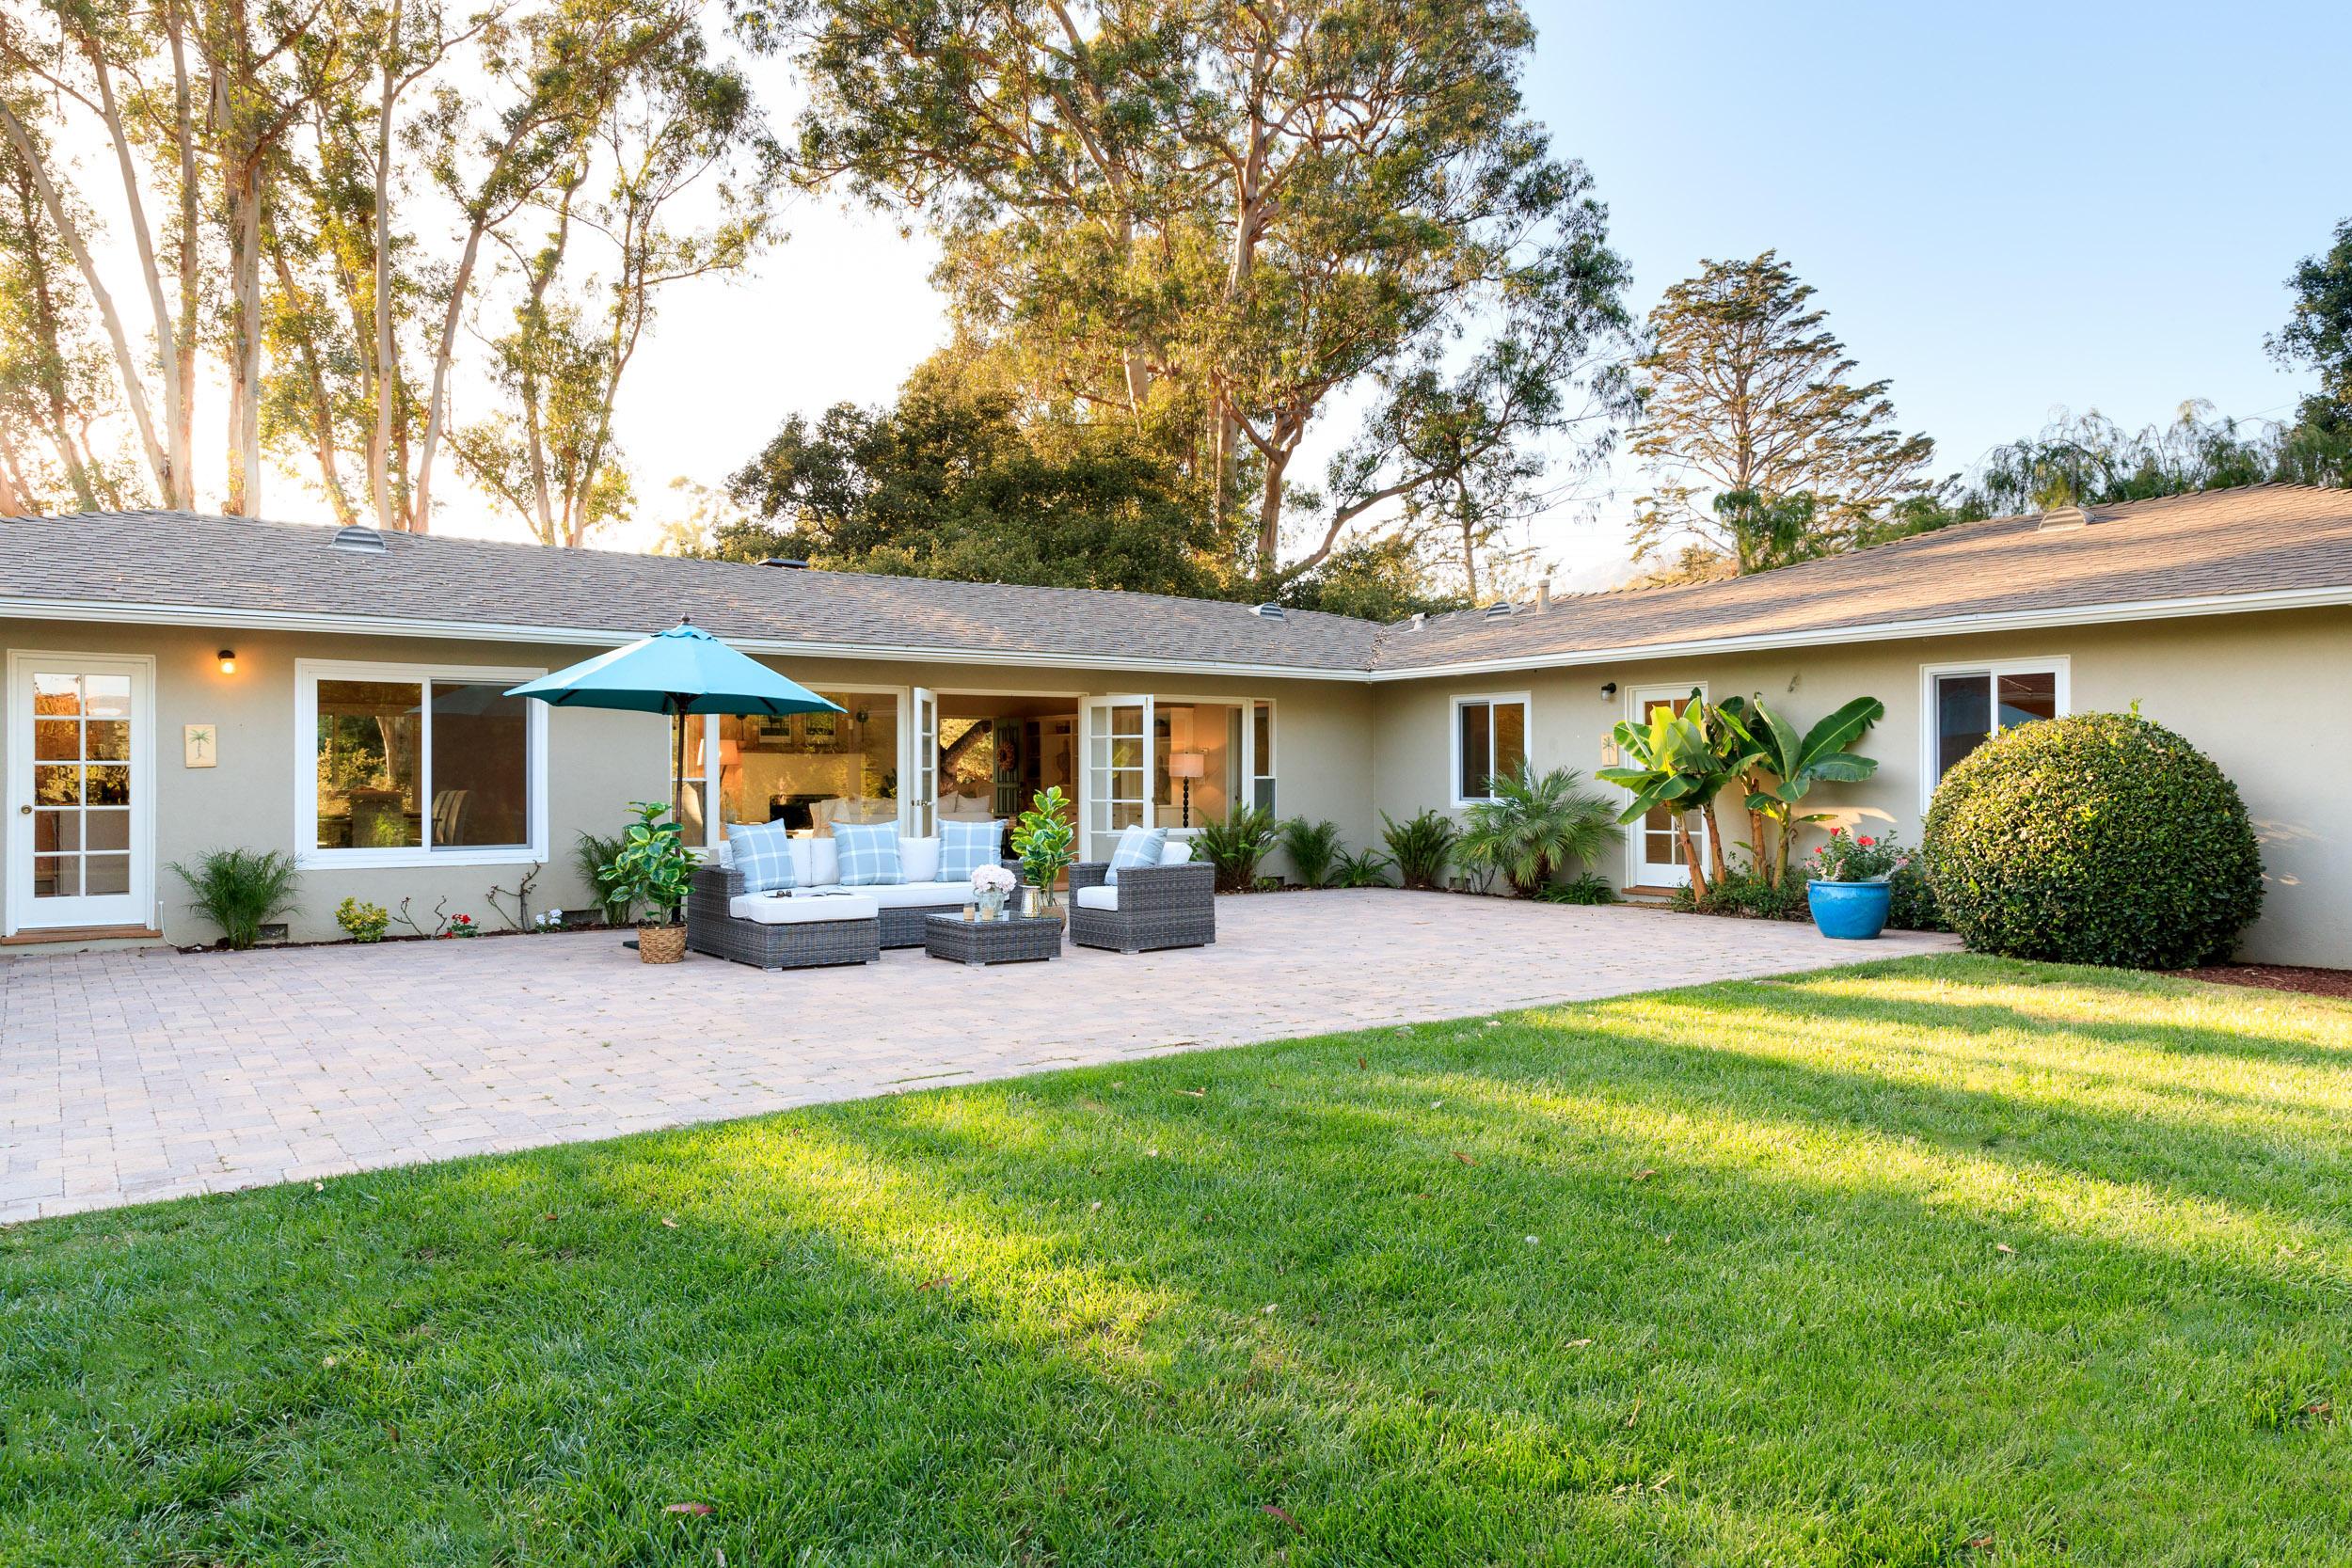 Property photo for 1407 School House Rd Santa Barbara, California 93108 - 17-3263